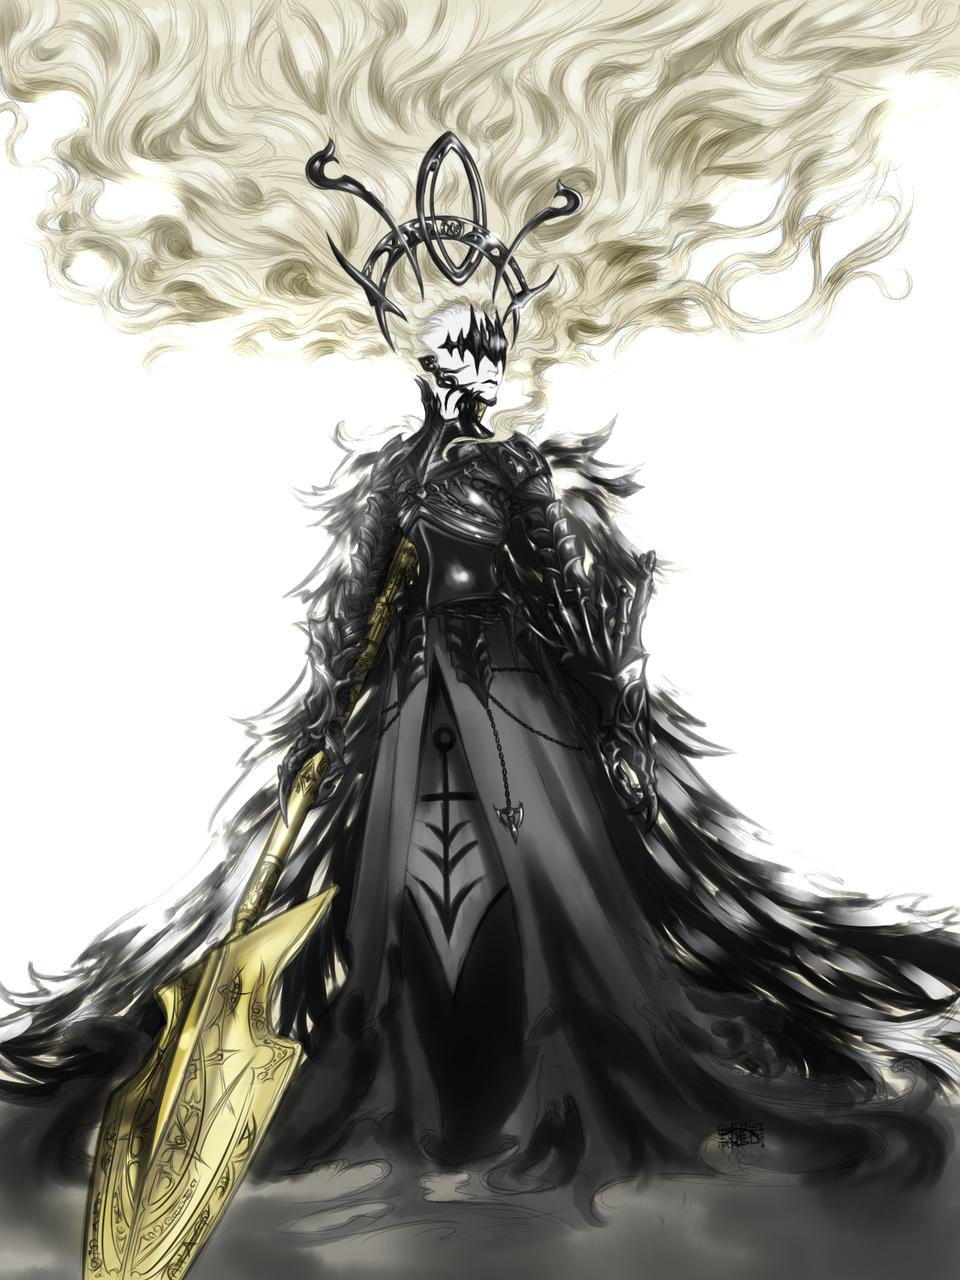 Alastor Illust of Manalodia fantasy March2021_Creature digital demon Alastor spear oc HeraphenttheBlack LostChildrenPt.1 fallenangel characterdesign